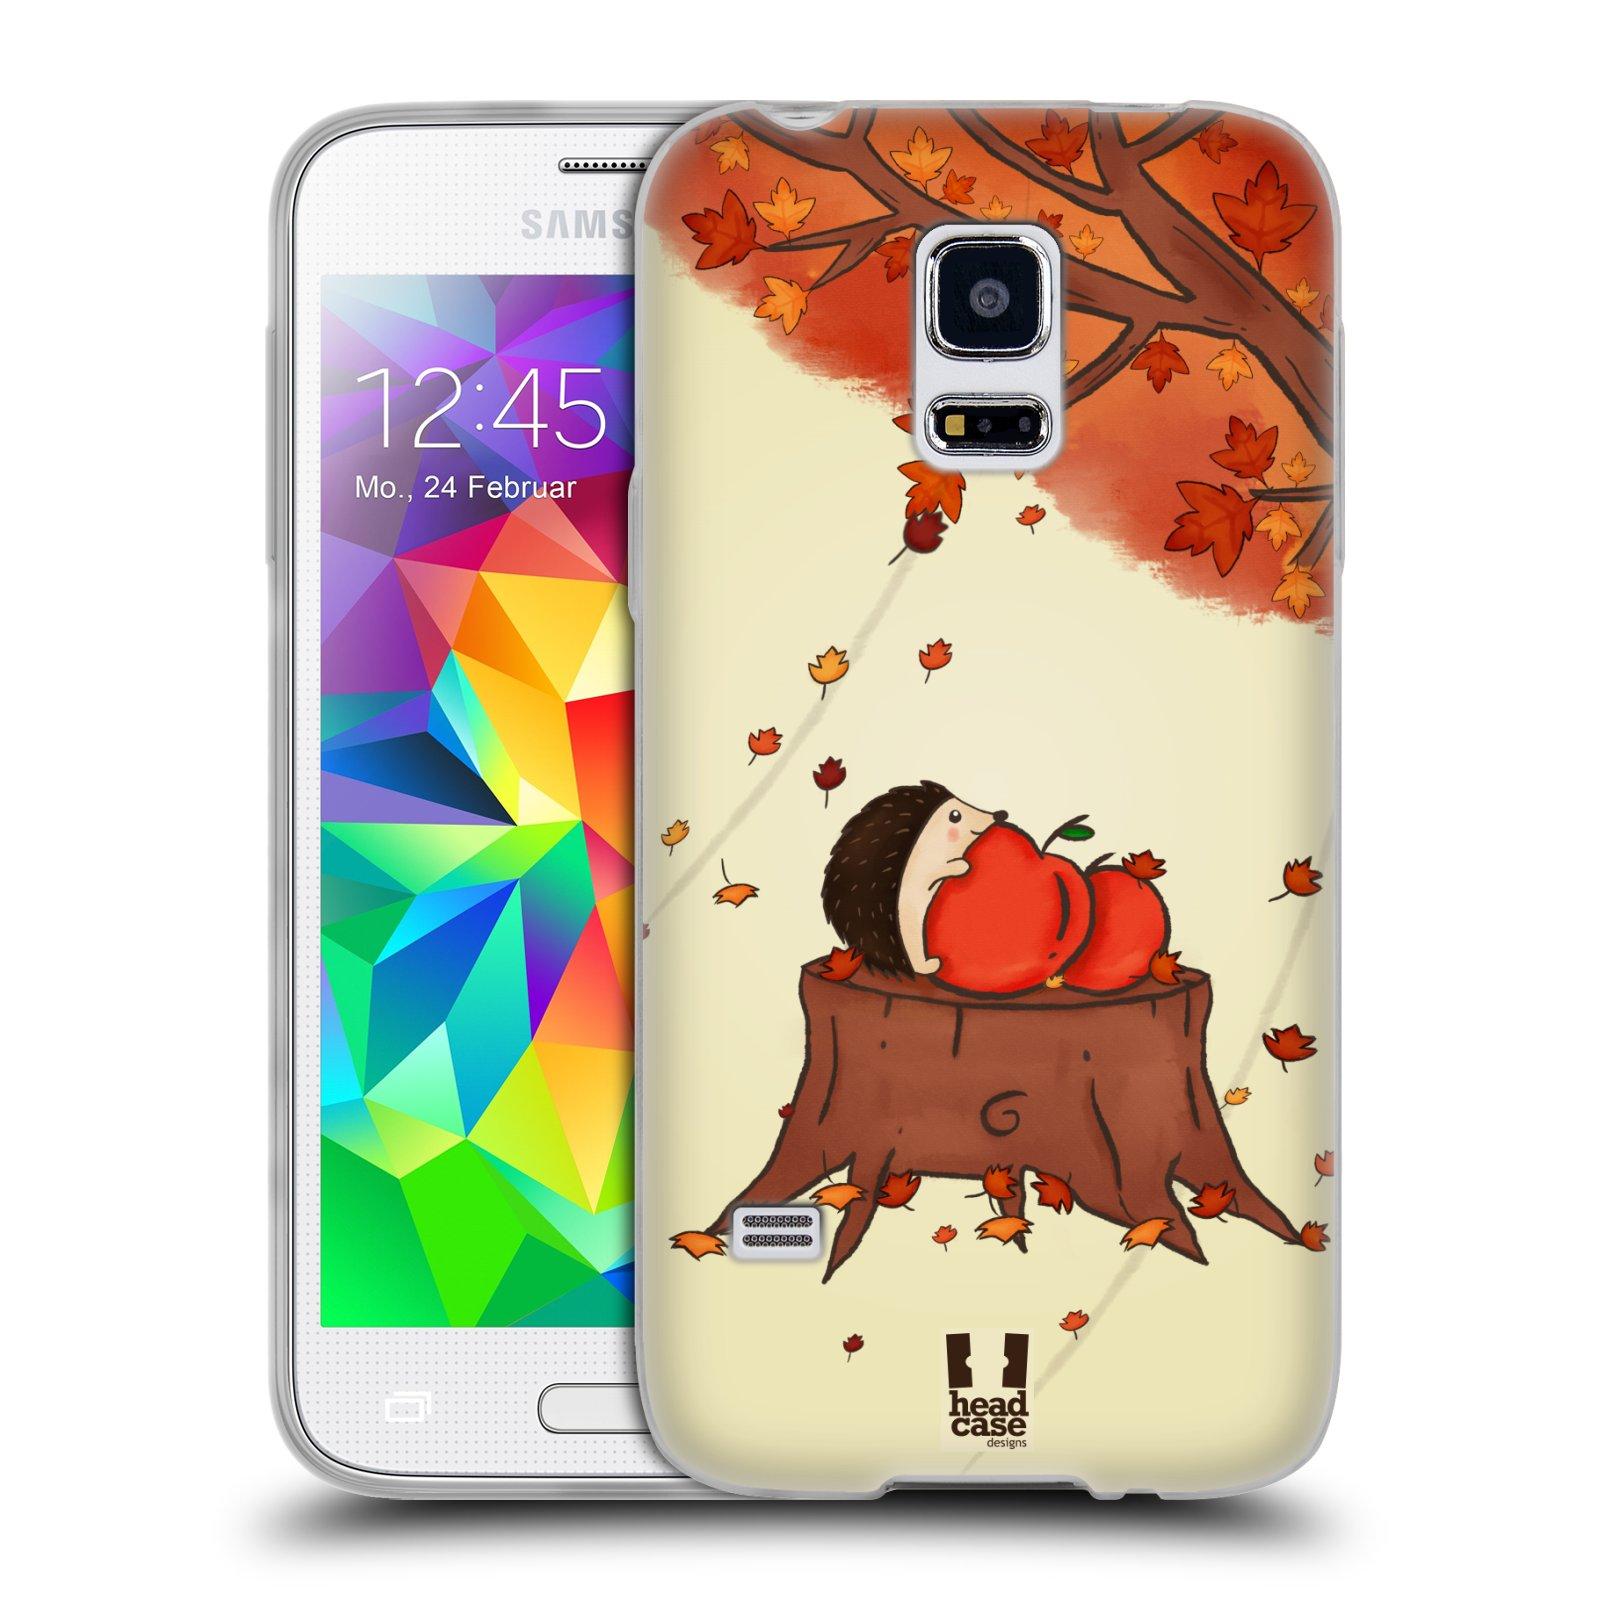 HEAD CASE silikonový obal na mobil Samsung Galaxy S5 MINI vzor podzimní zvířátka ježek a jablíčka